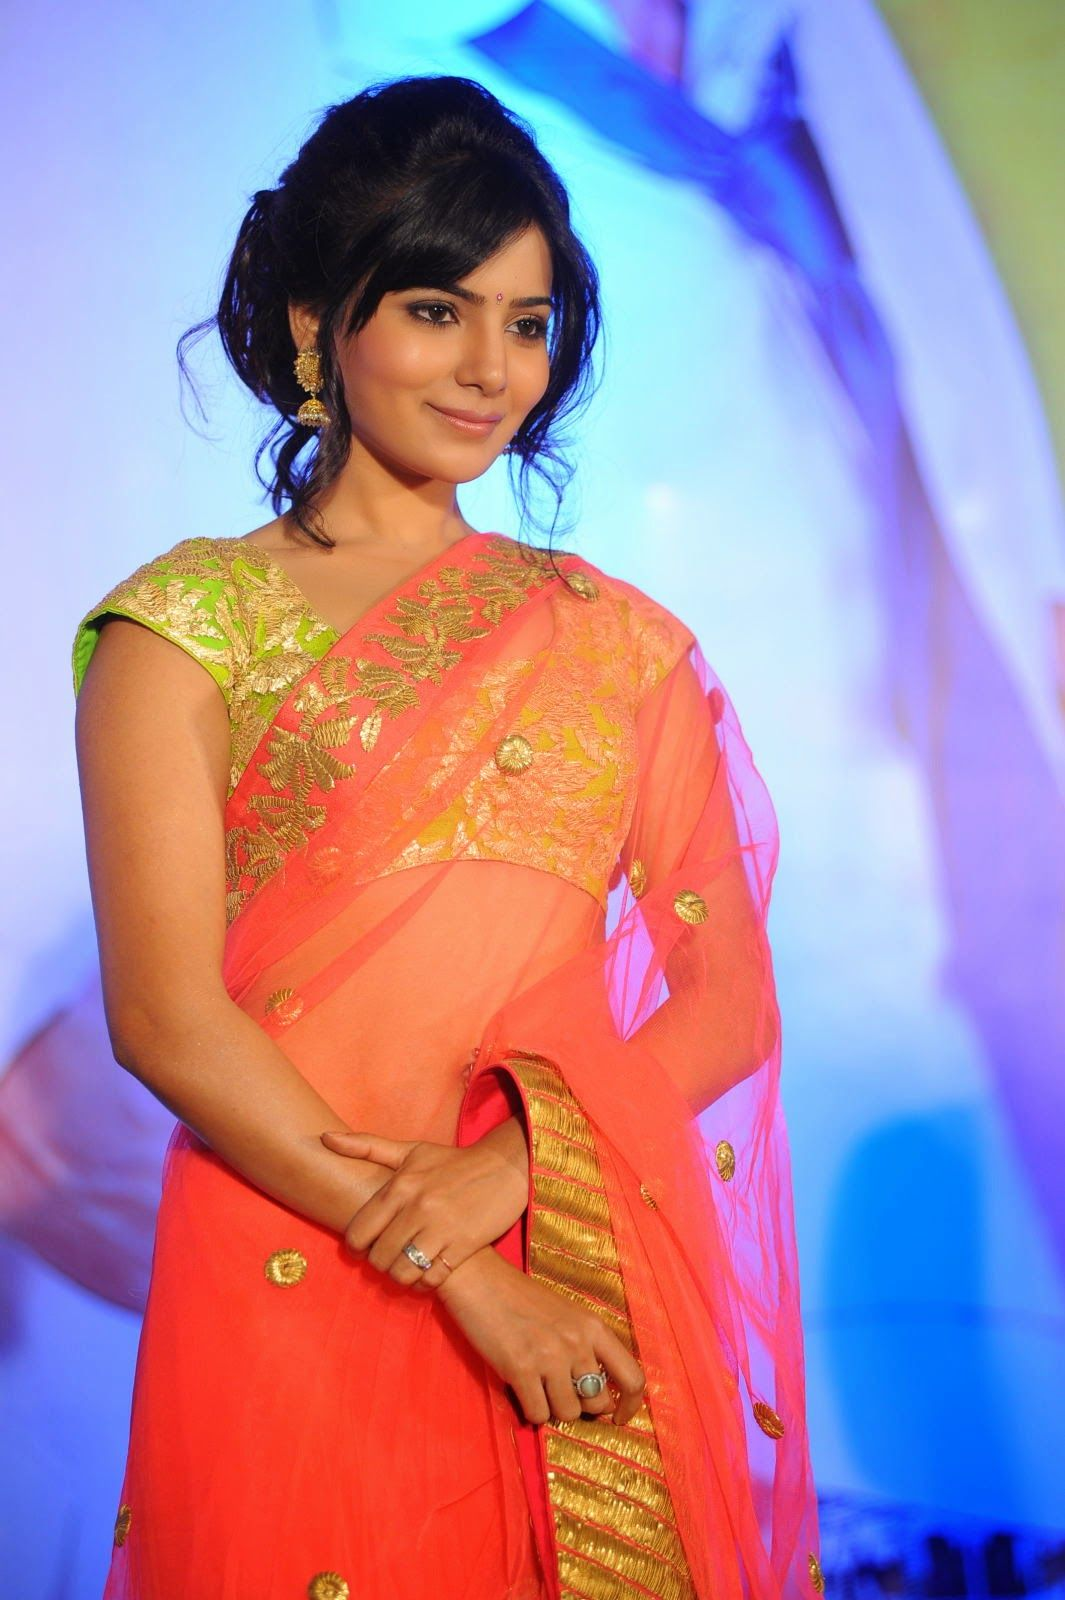 actress hd gallery samantha cute saree hd hot photo galleryz | hd